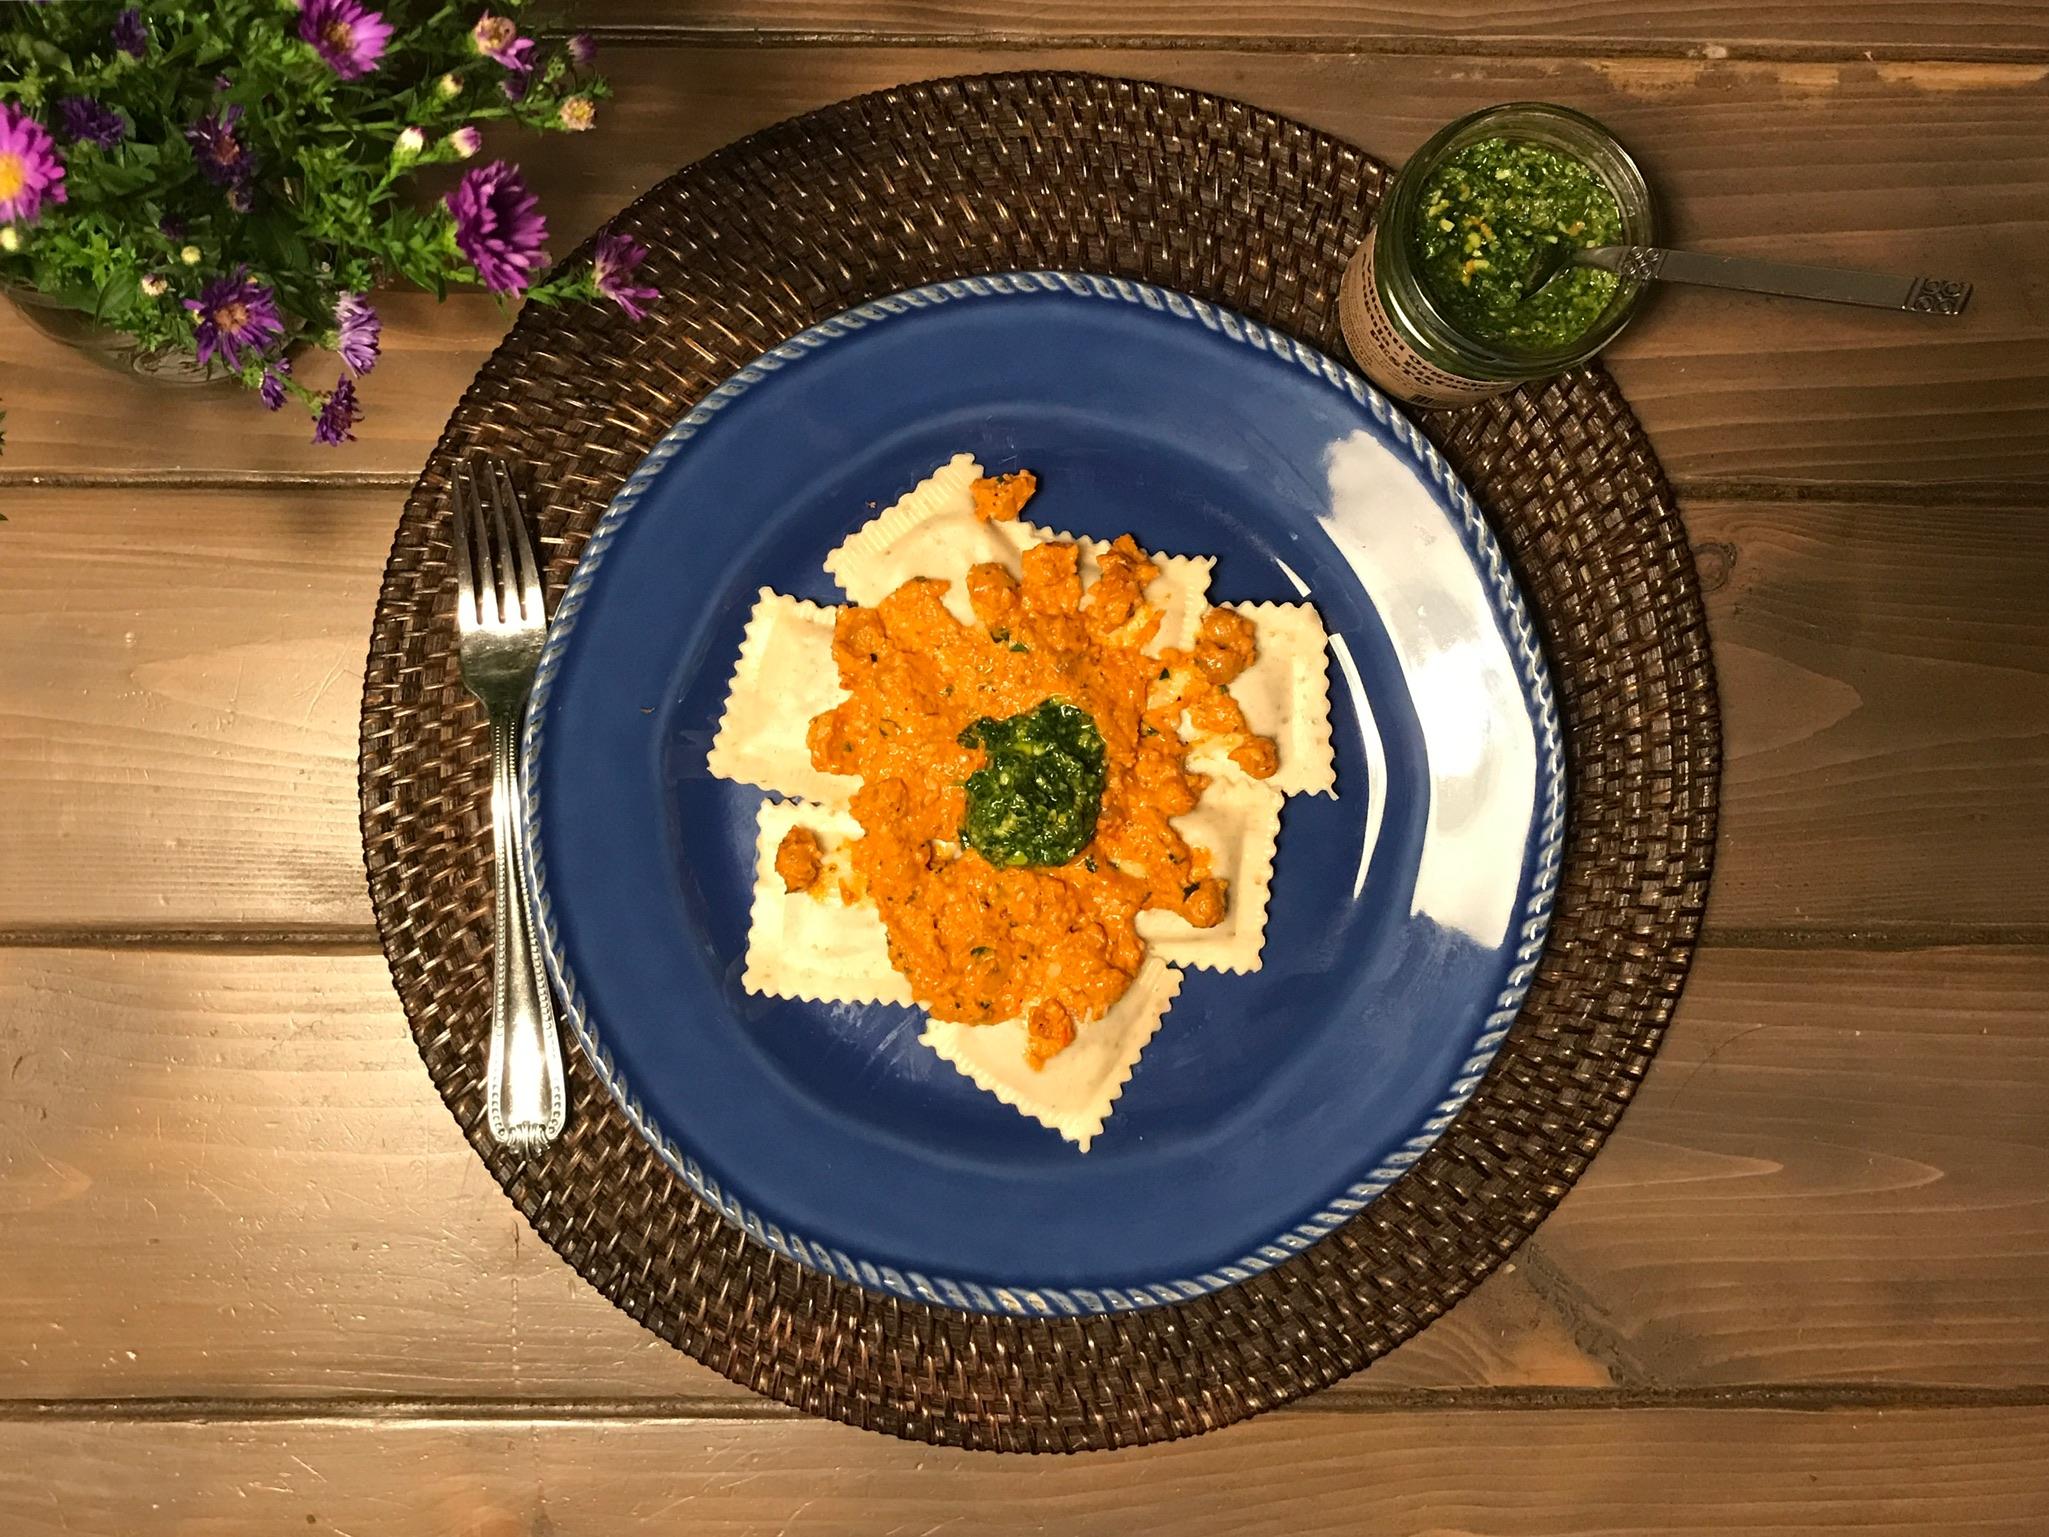 Romesco Sauce w/ Sautéed Chickpeas and Parsley  (feat. Slow BBQ Lamb w/ Caramelized Sweet Potato Ravioli)